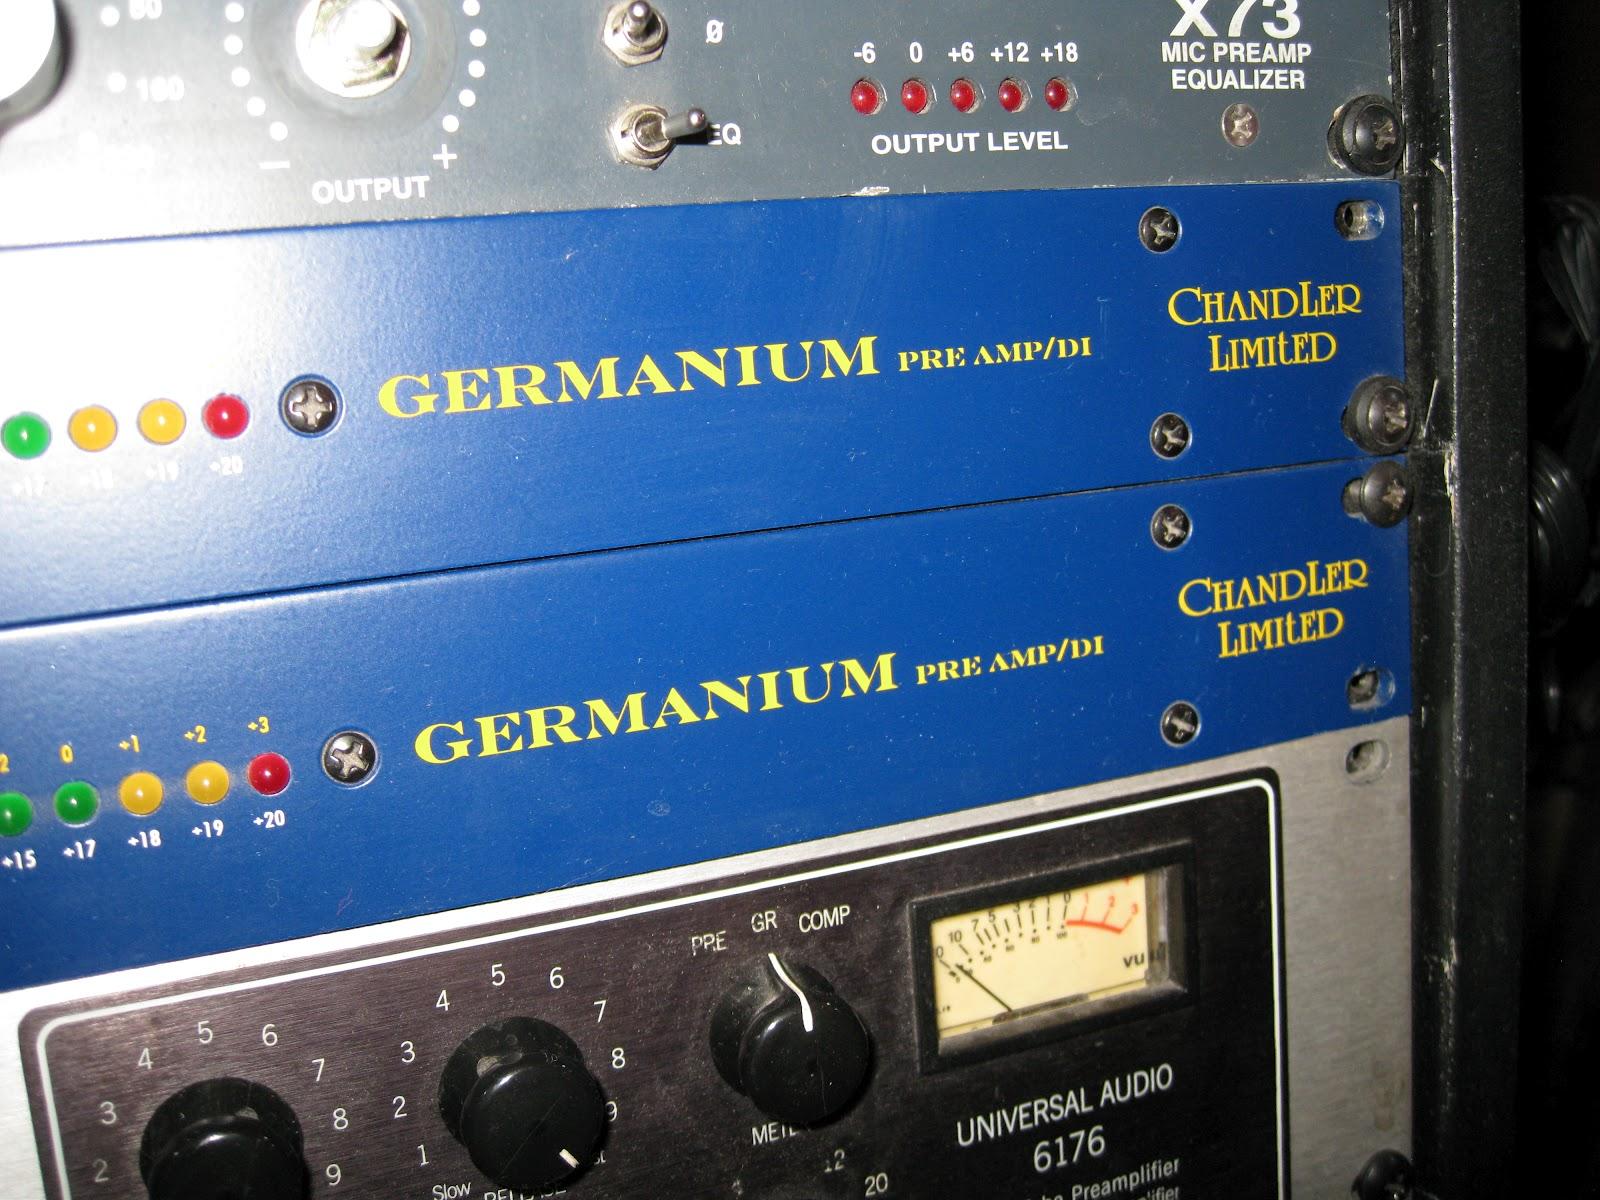 Mixing Audio 101 Mic And Preamp Shootout At Capricorn Studios Dynamic Preamplifier Vintech 473 Josh Mallit Neve 33145 Chandler Limited Germanium Cascade Vinjet Vin